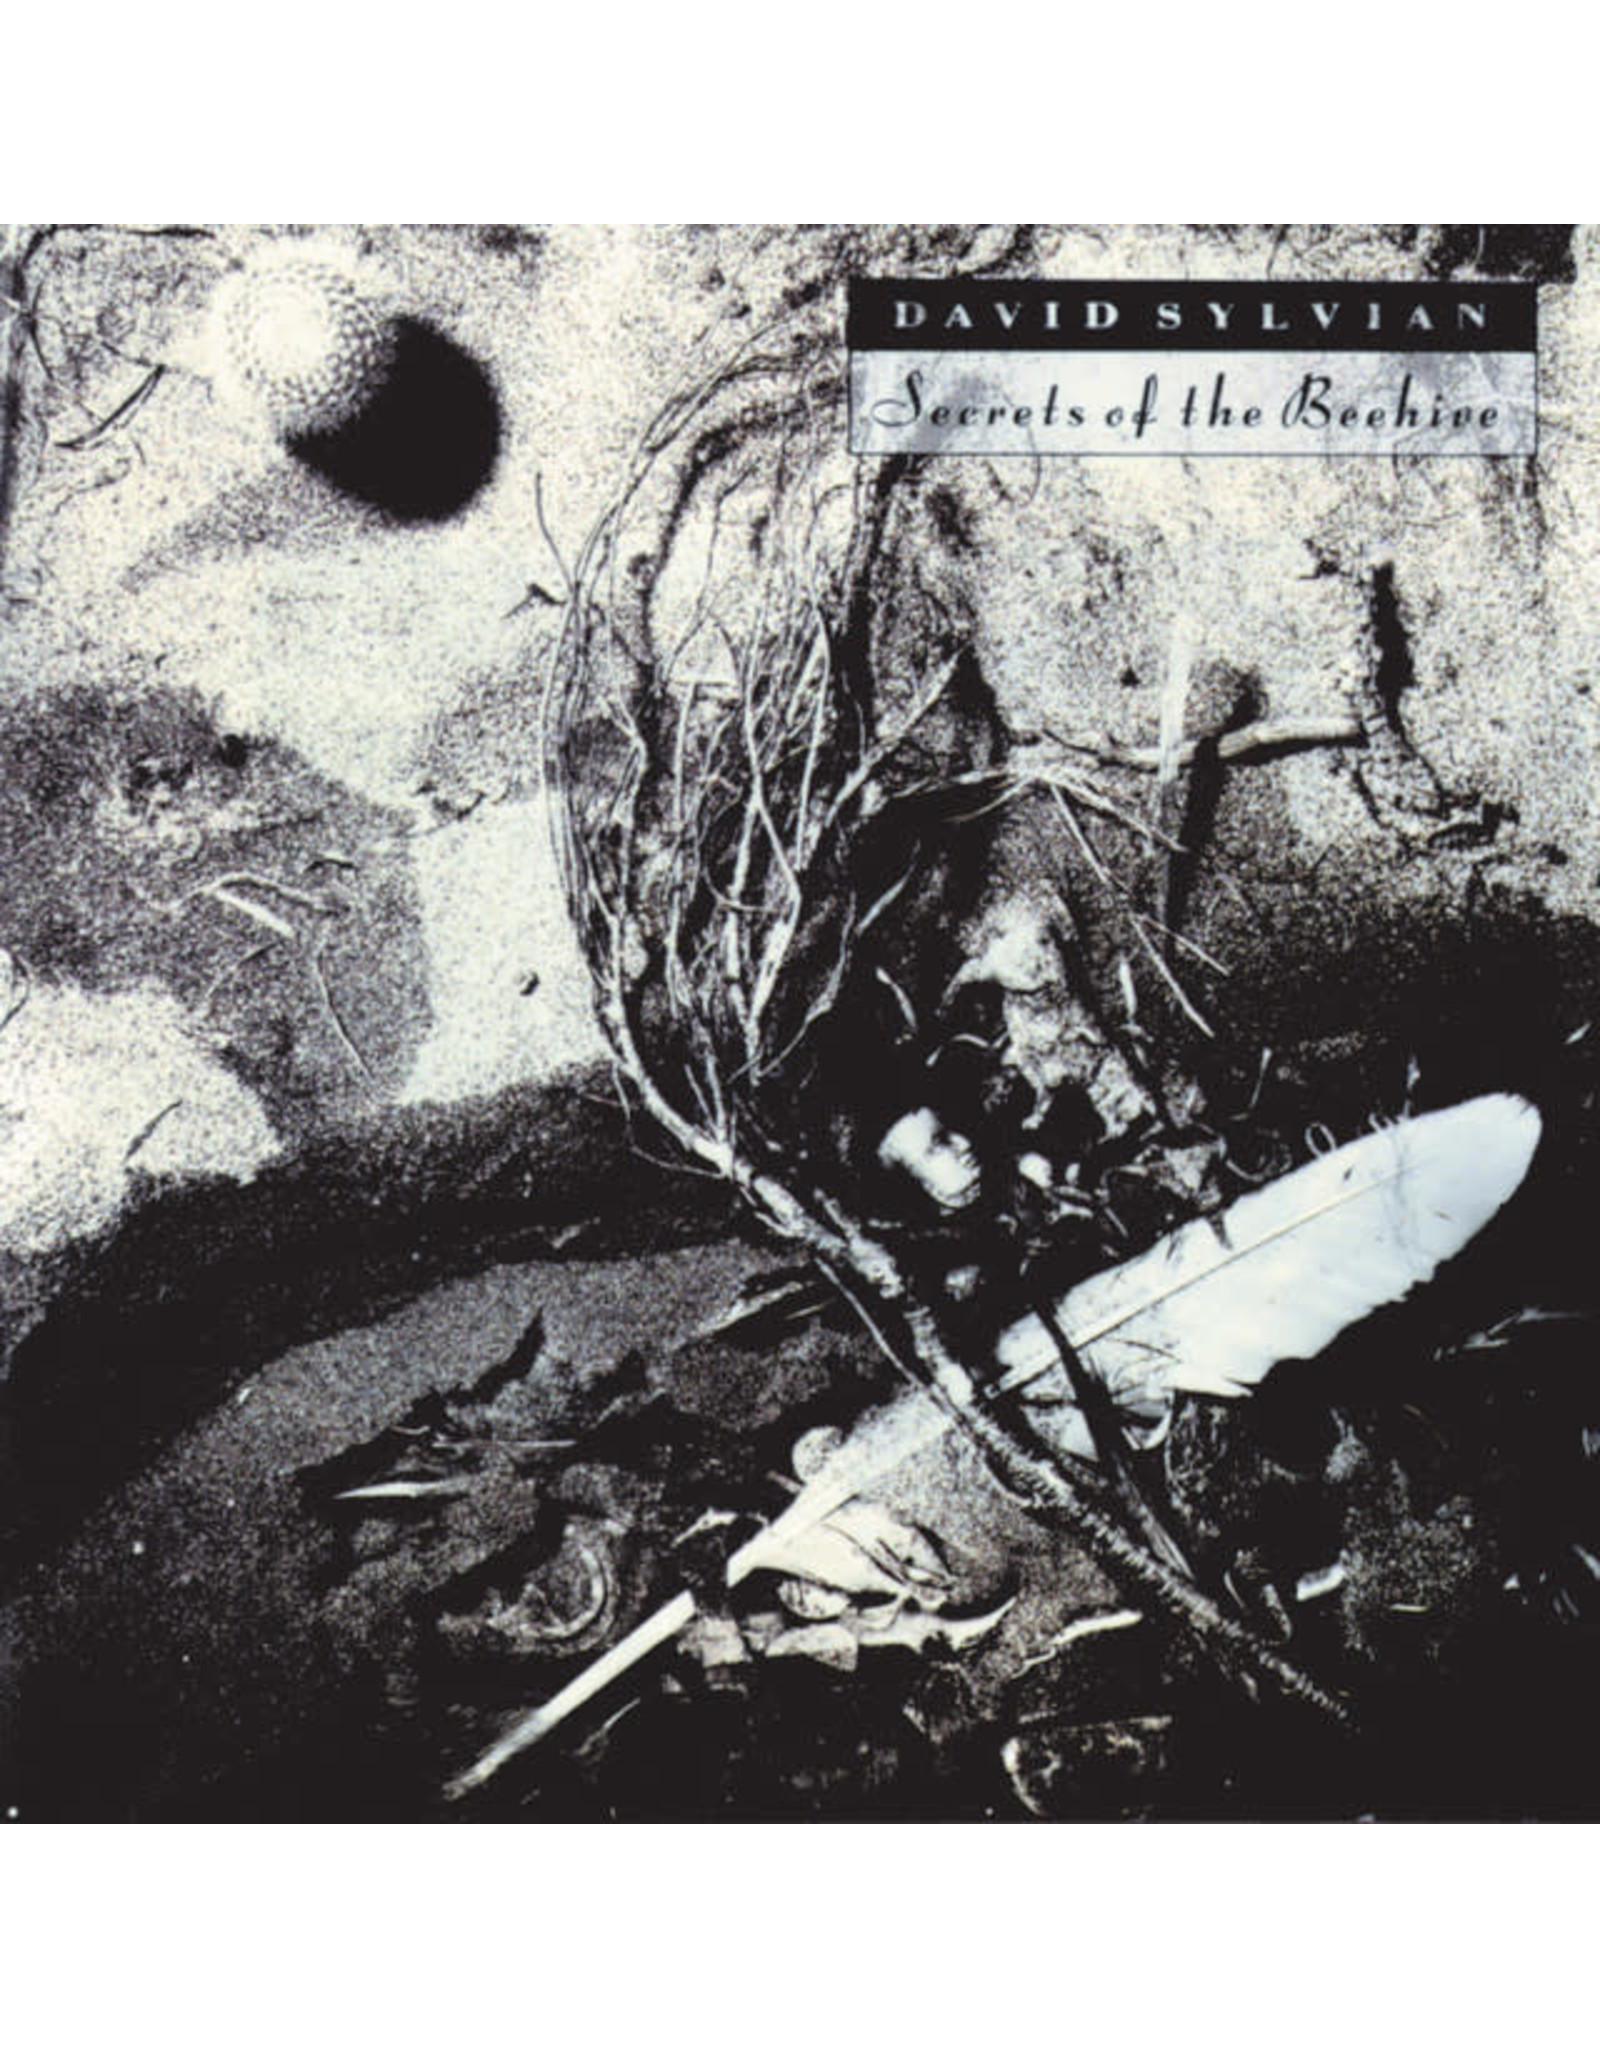 Vinyl David Sylvian - Secrets of the Beehive